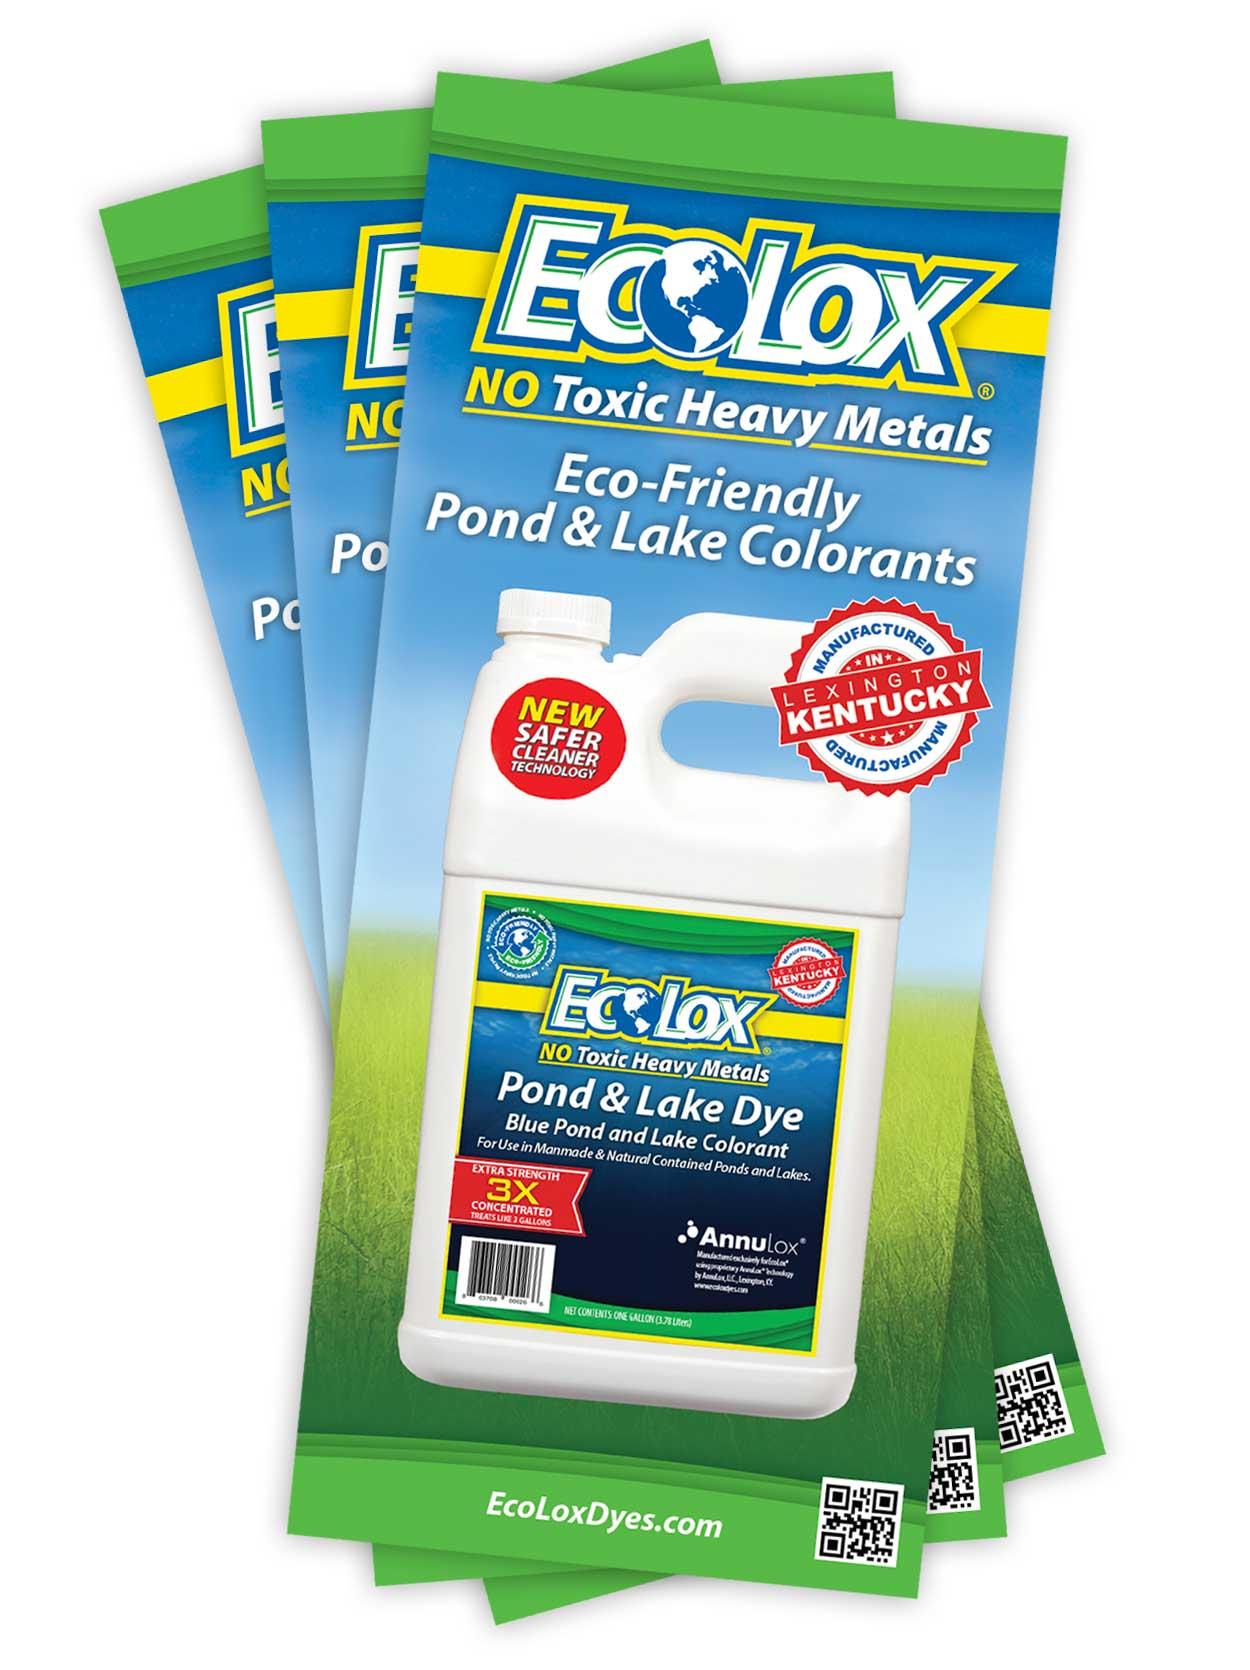 EcoLox Dyes Brochure - Print Design